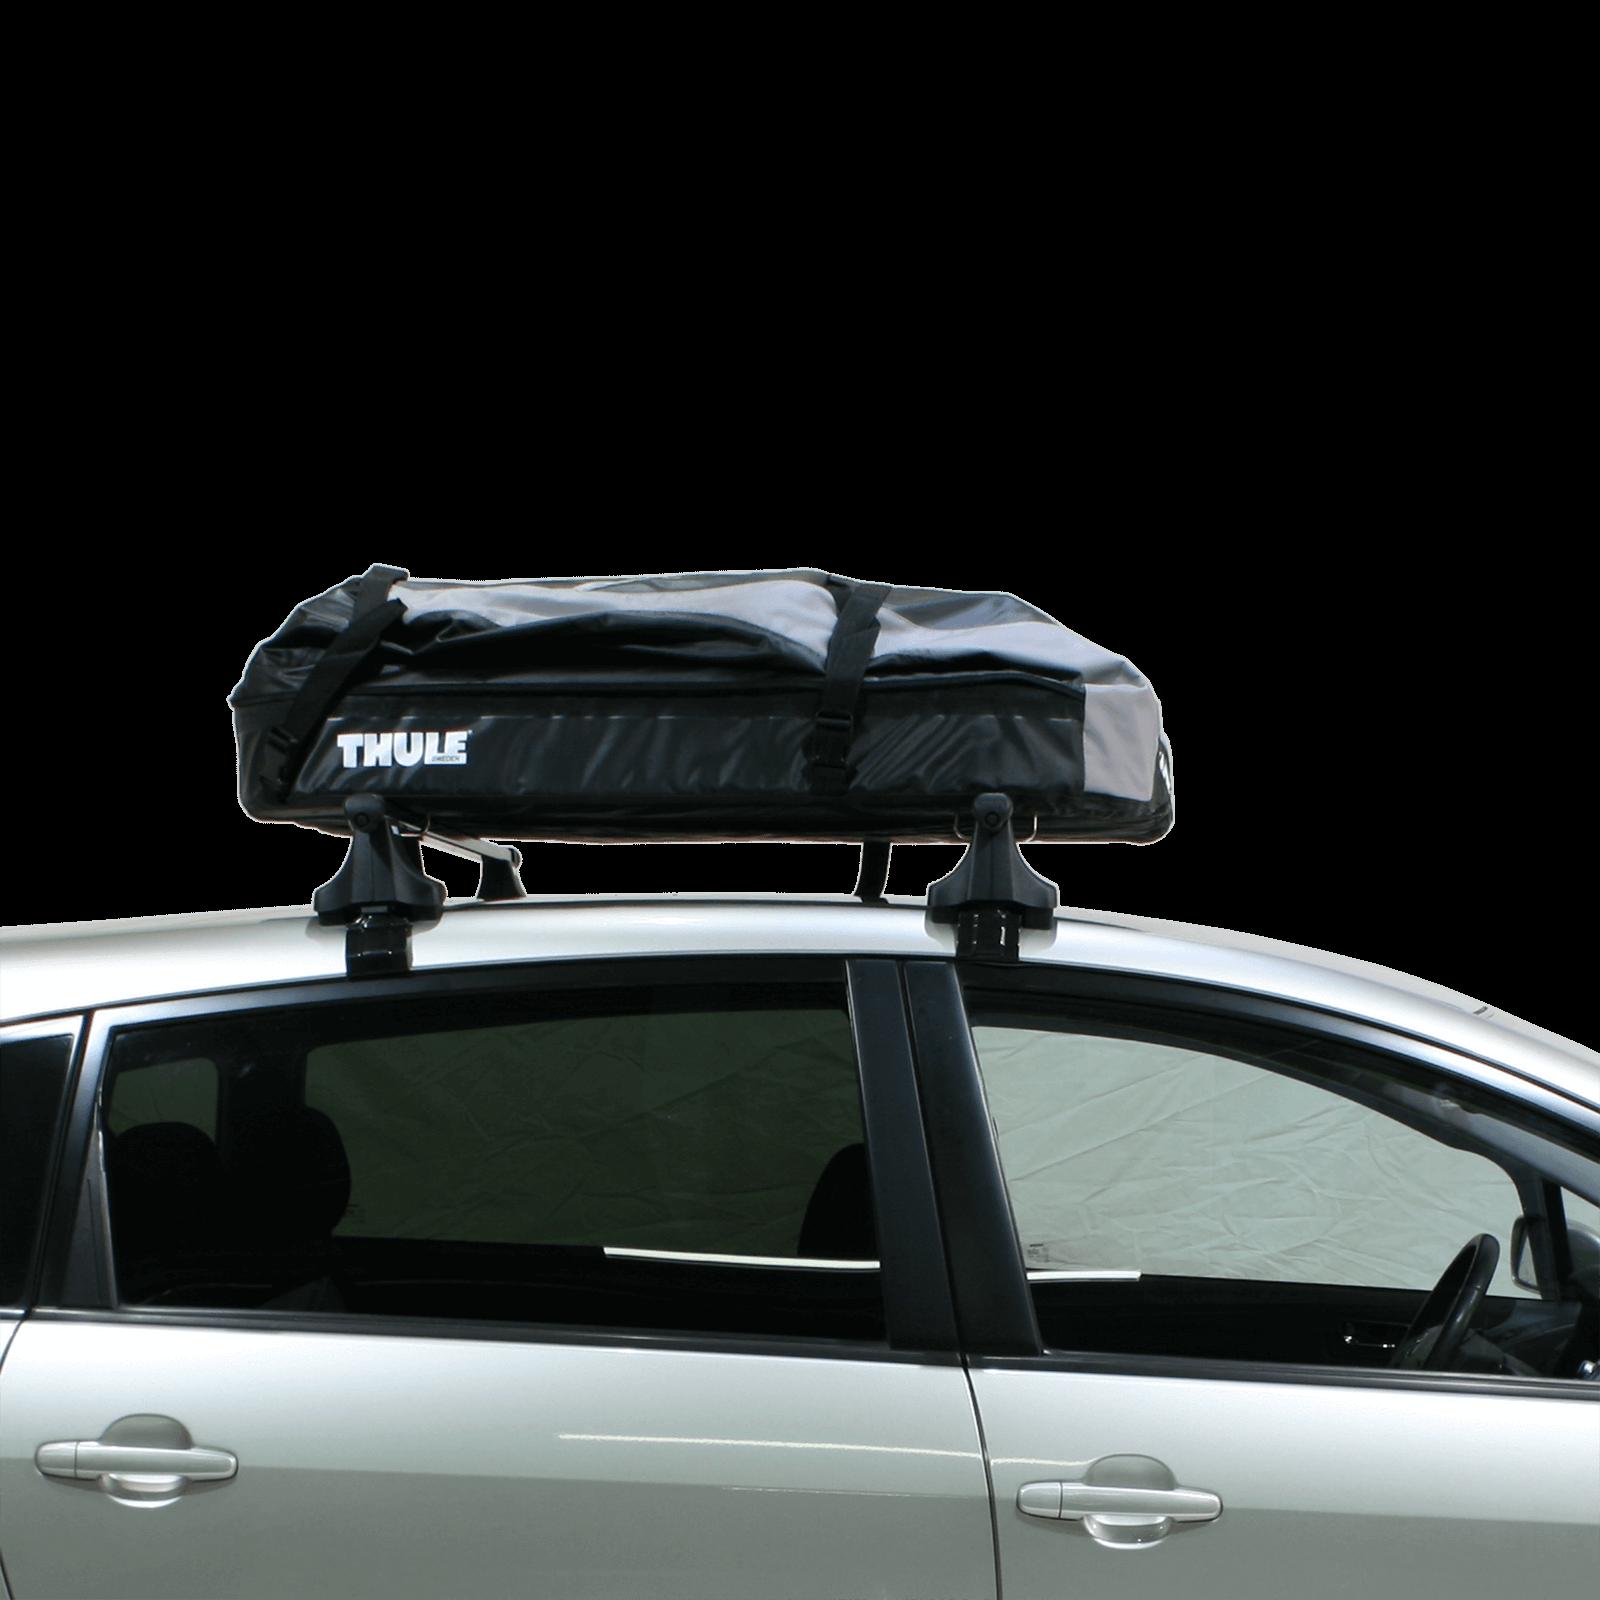 Dachbox Thule Ranger 90 Black/Silver Gray - Bild 3